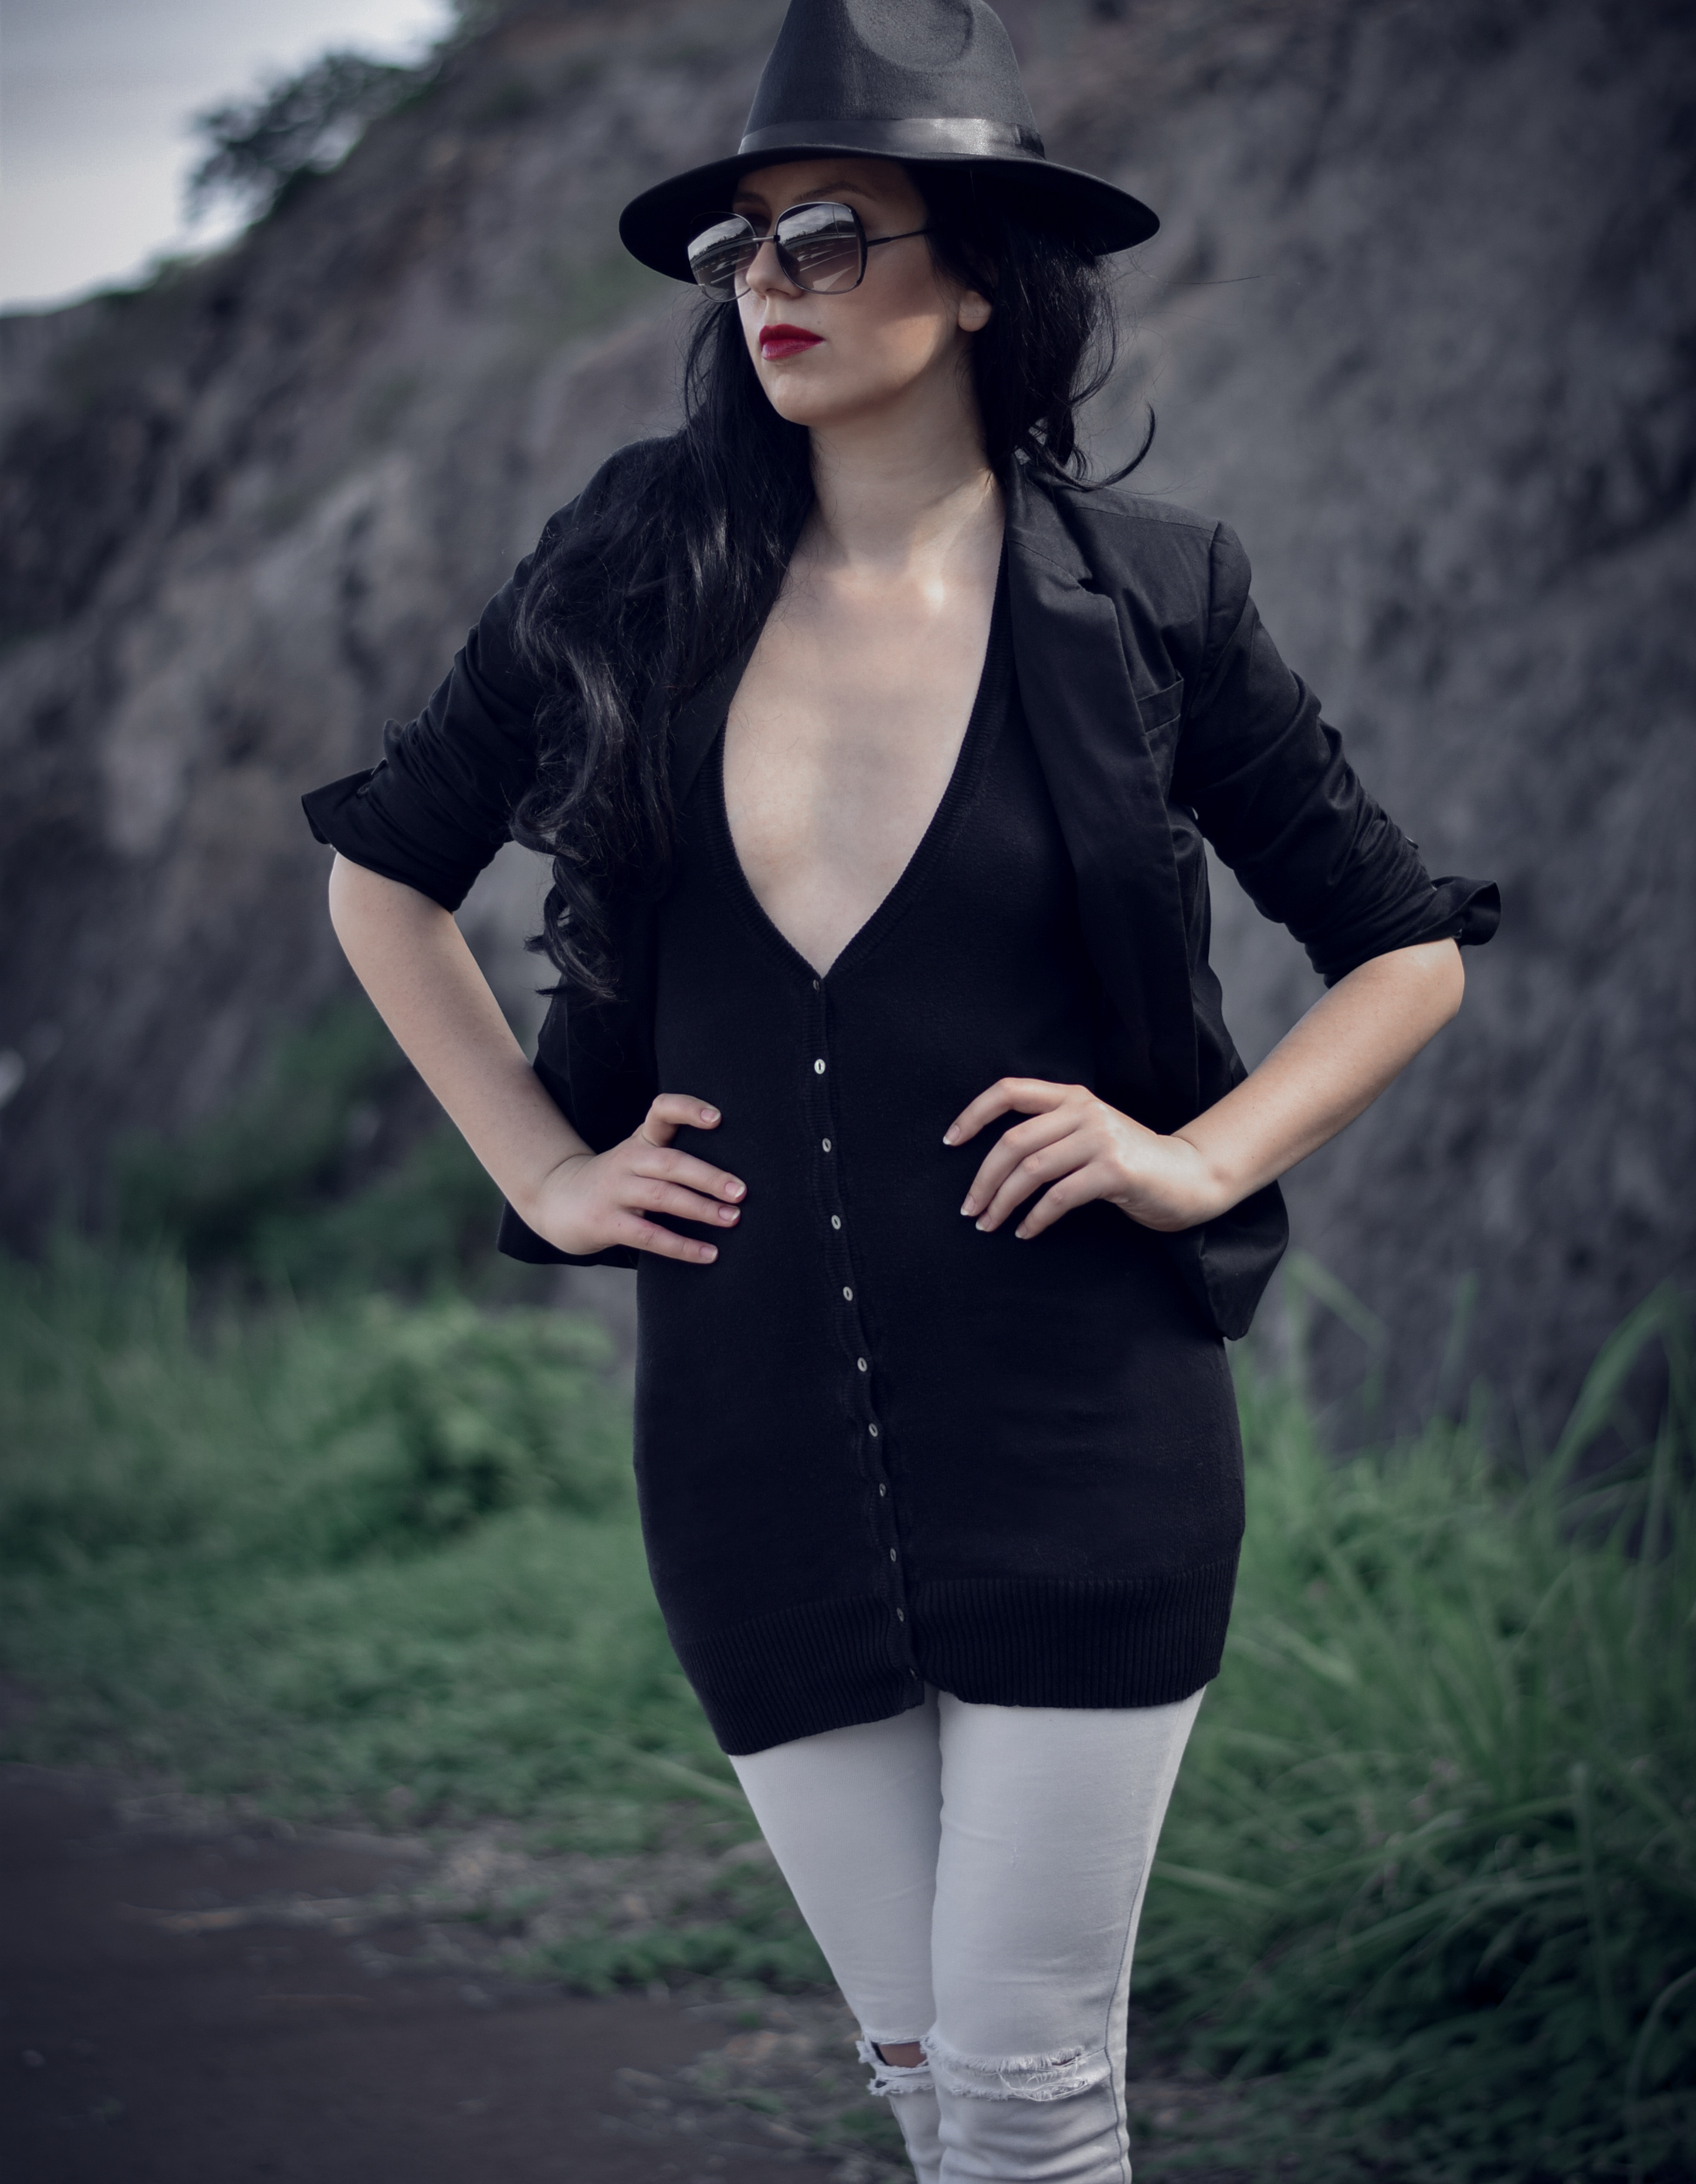 Rblack fedora hat long black cardigan deep v neck fashion blogger photography (2)